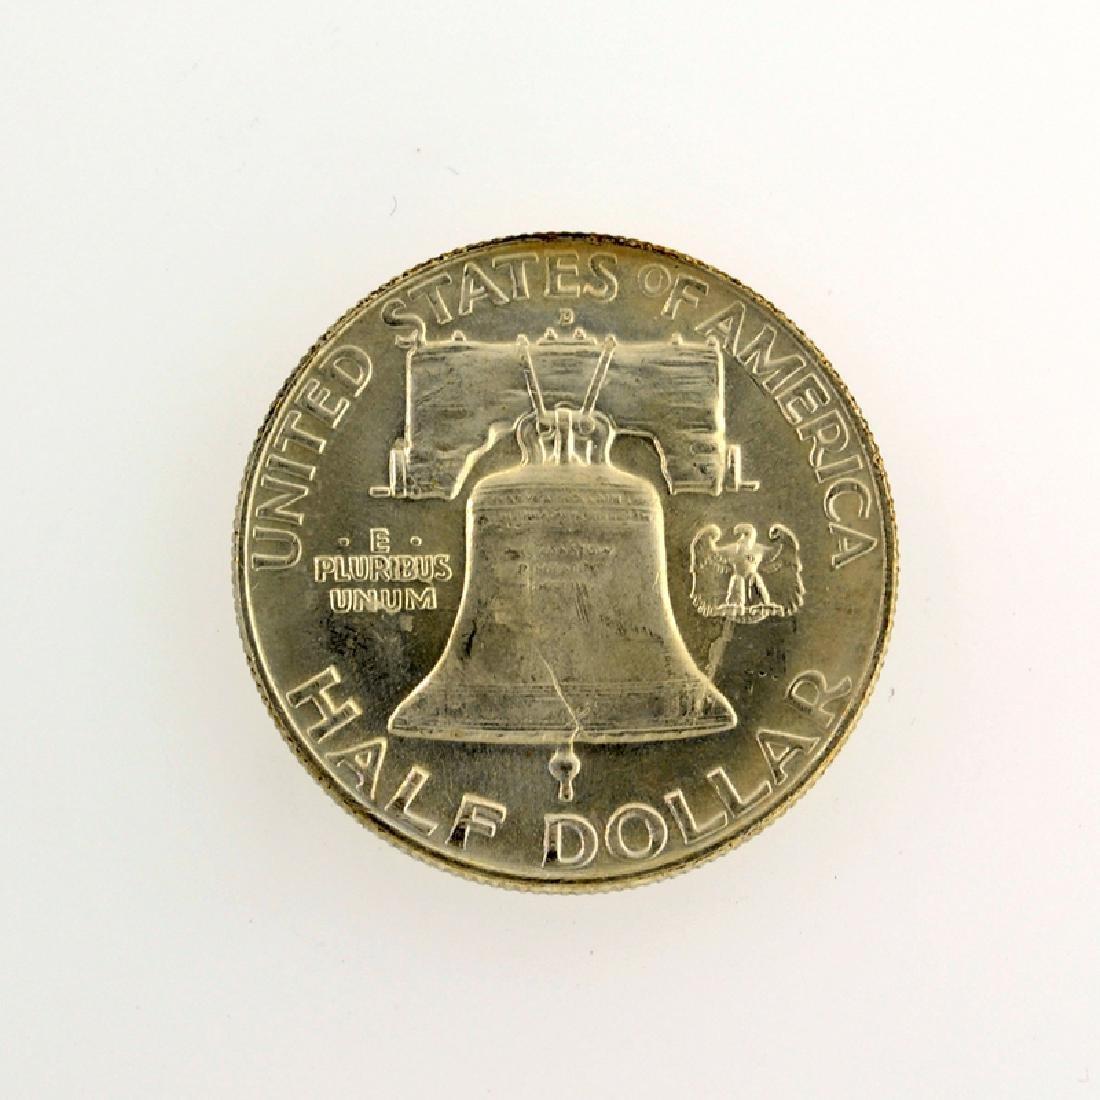 1957-D Franklin Liberty Bell Half Dollar Coin - 2